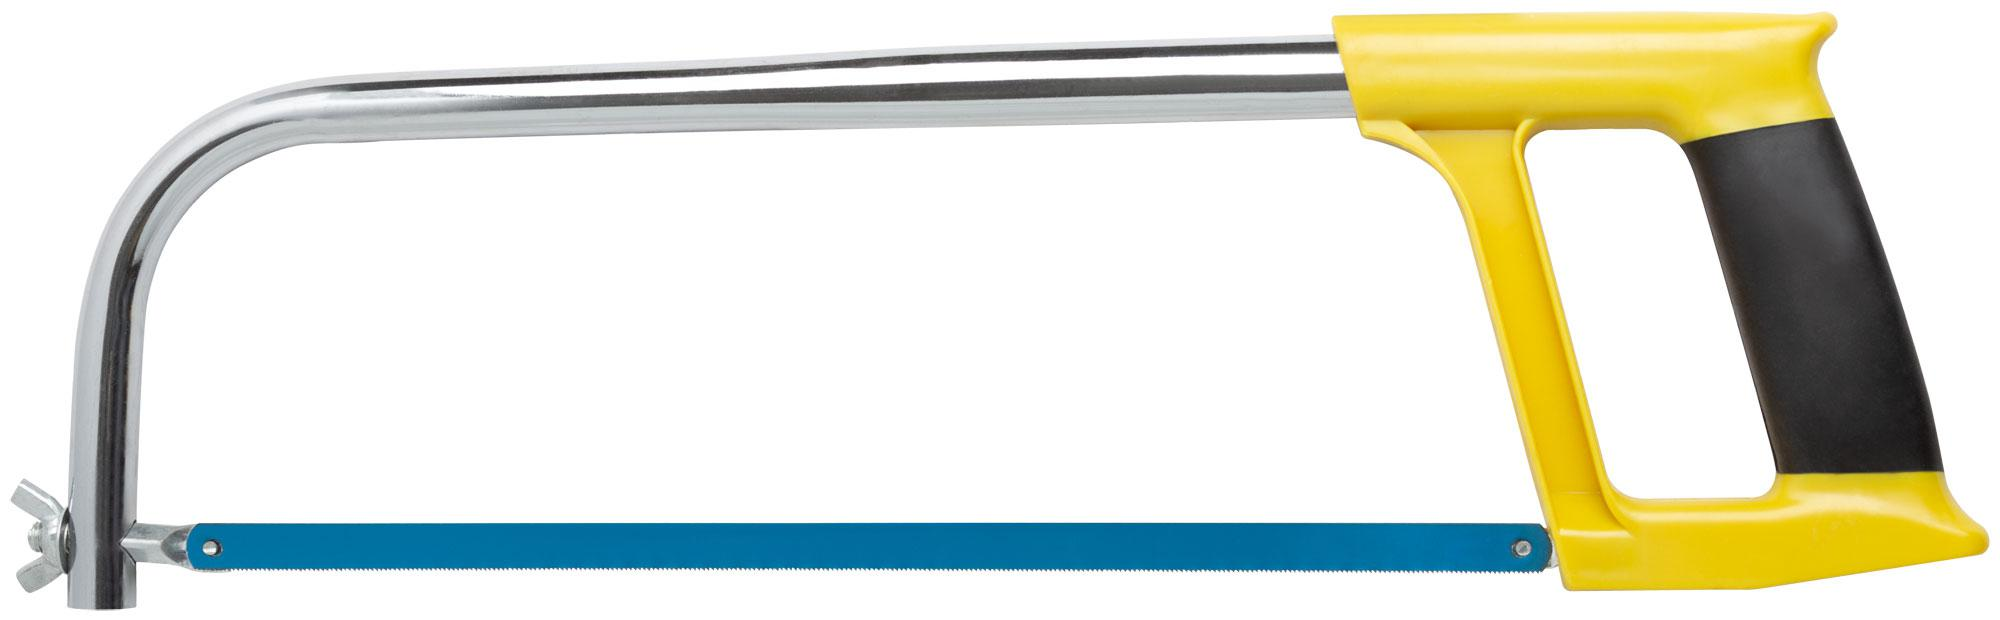 Ножовка по металлу Fit 40067